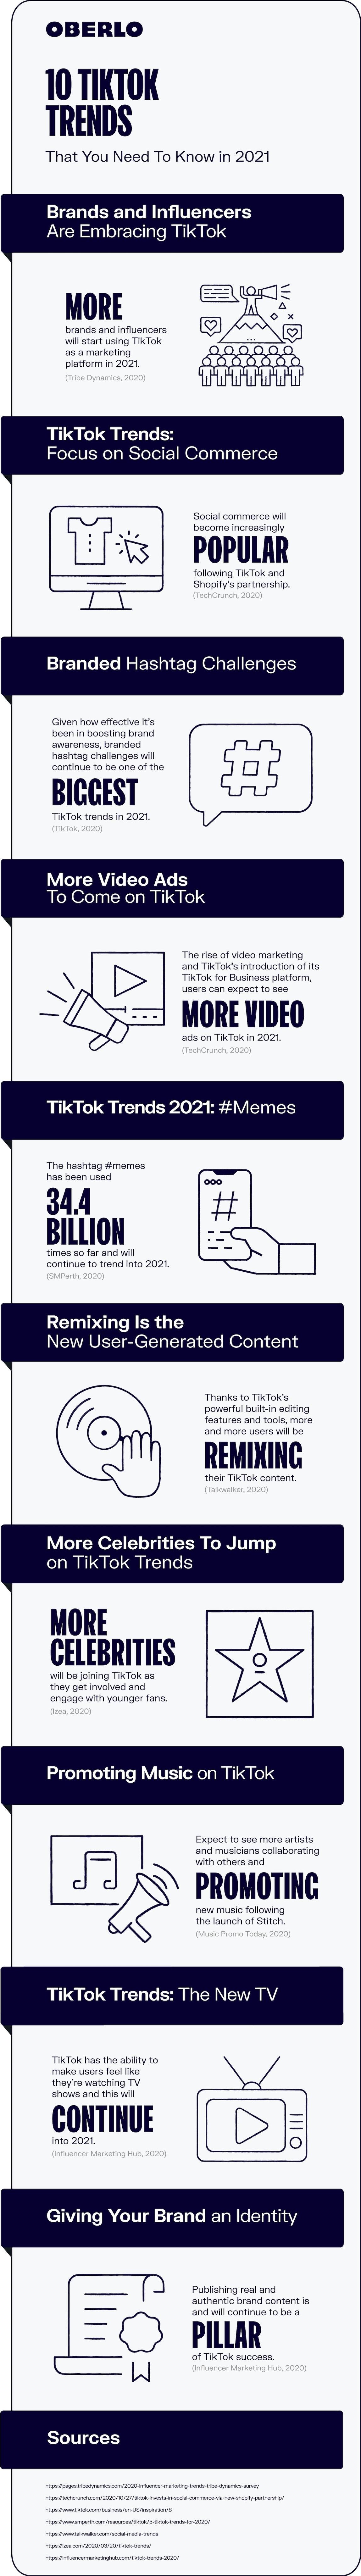 Tiktok Trends 2021